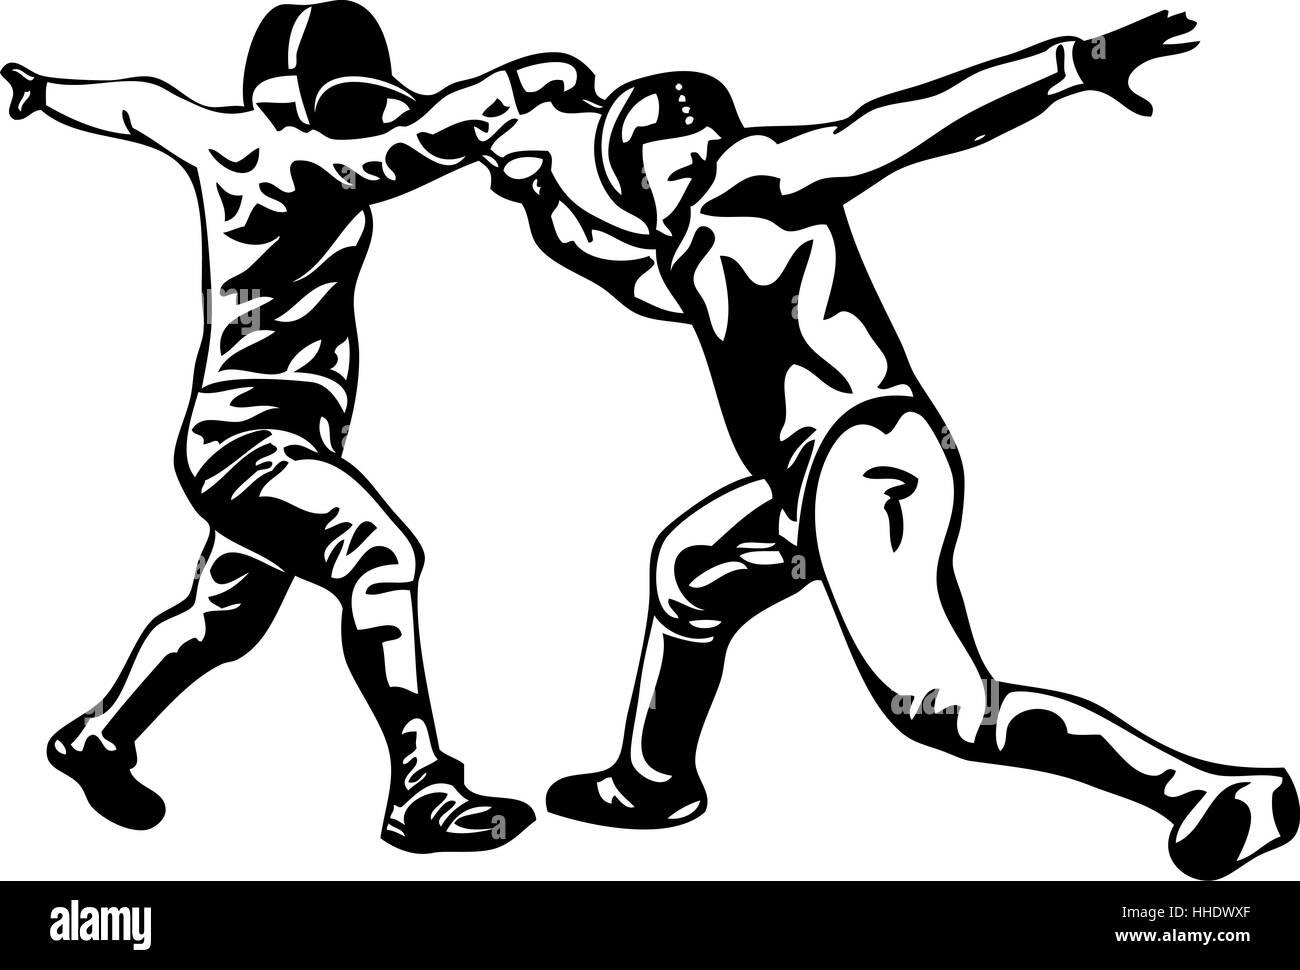 sport, sports, colour, illustration, paint, draw, cartoon, humans ...